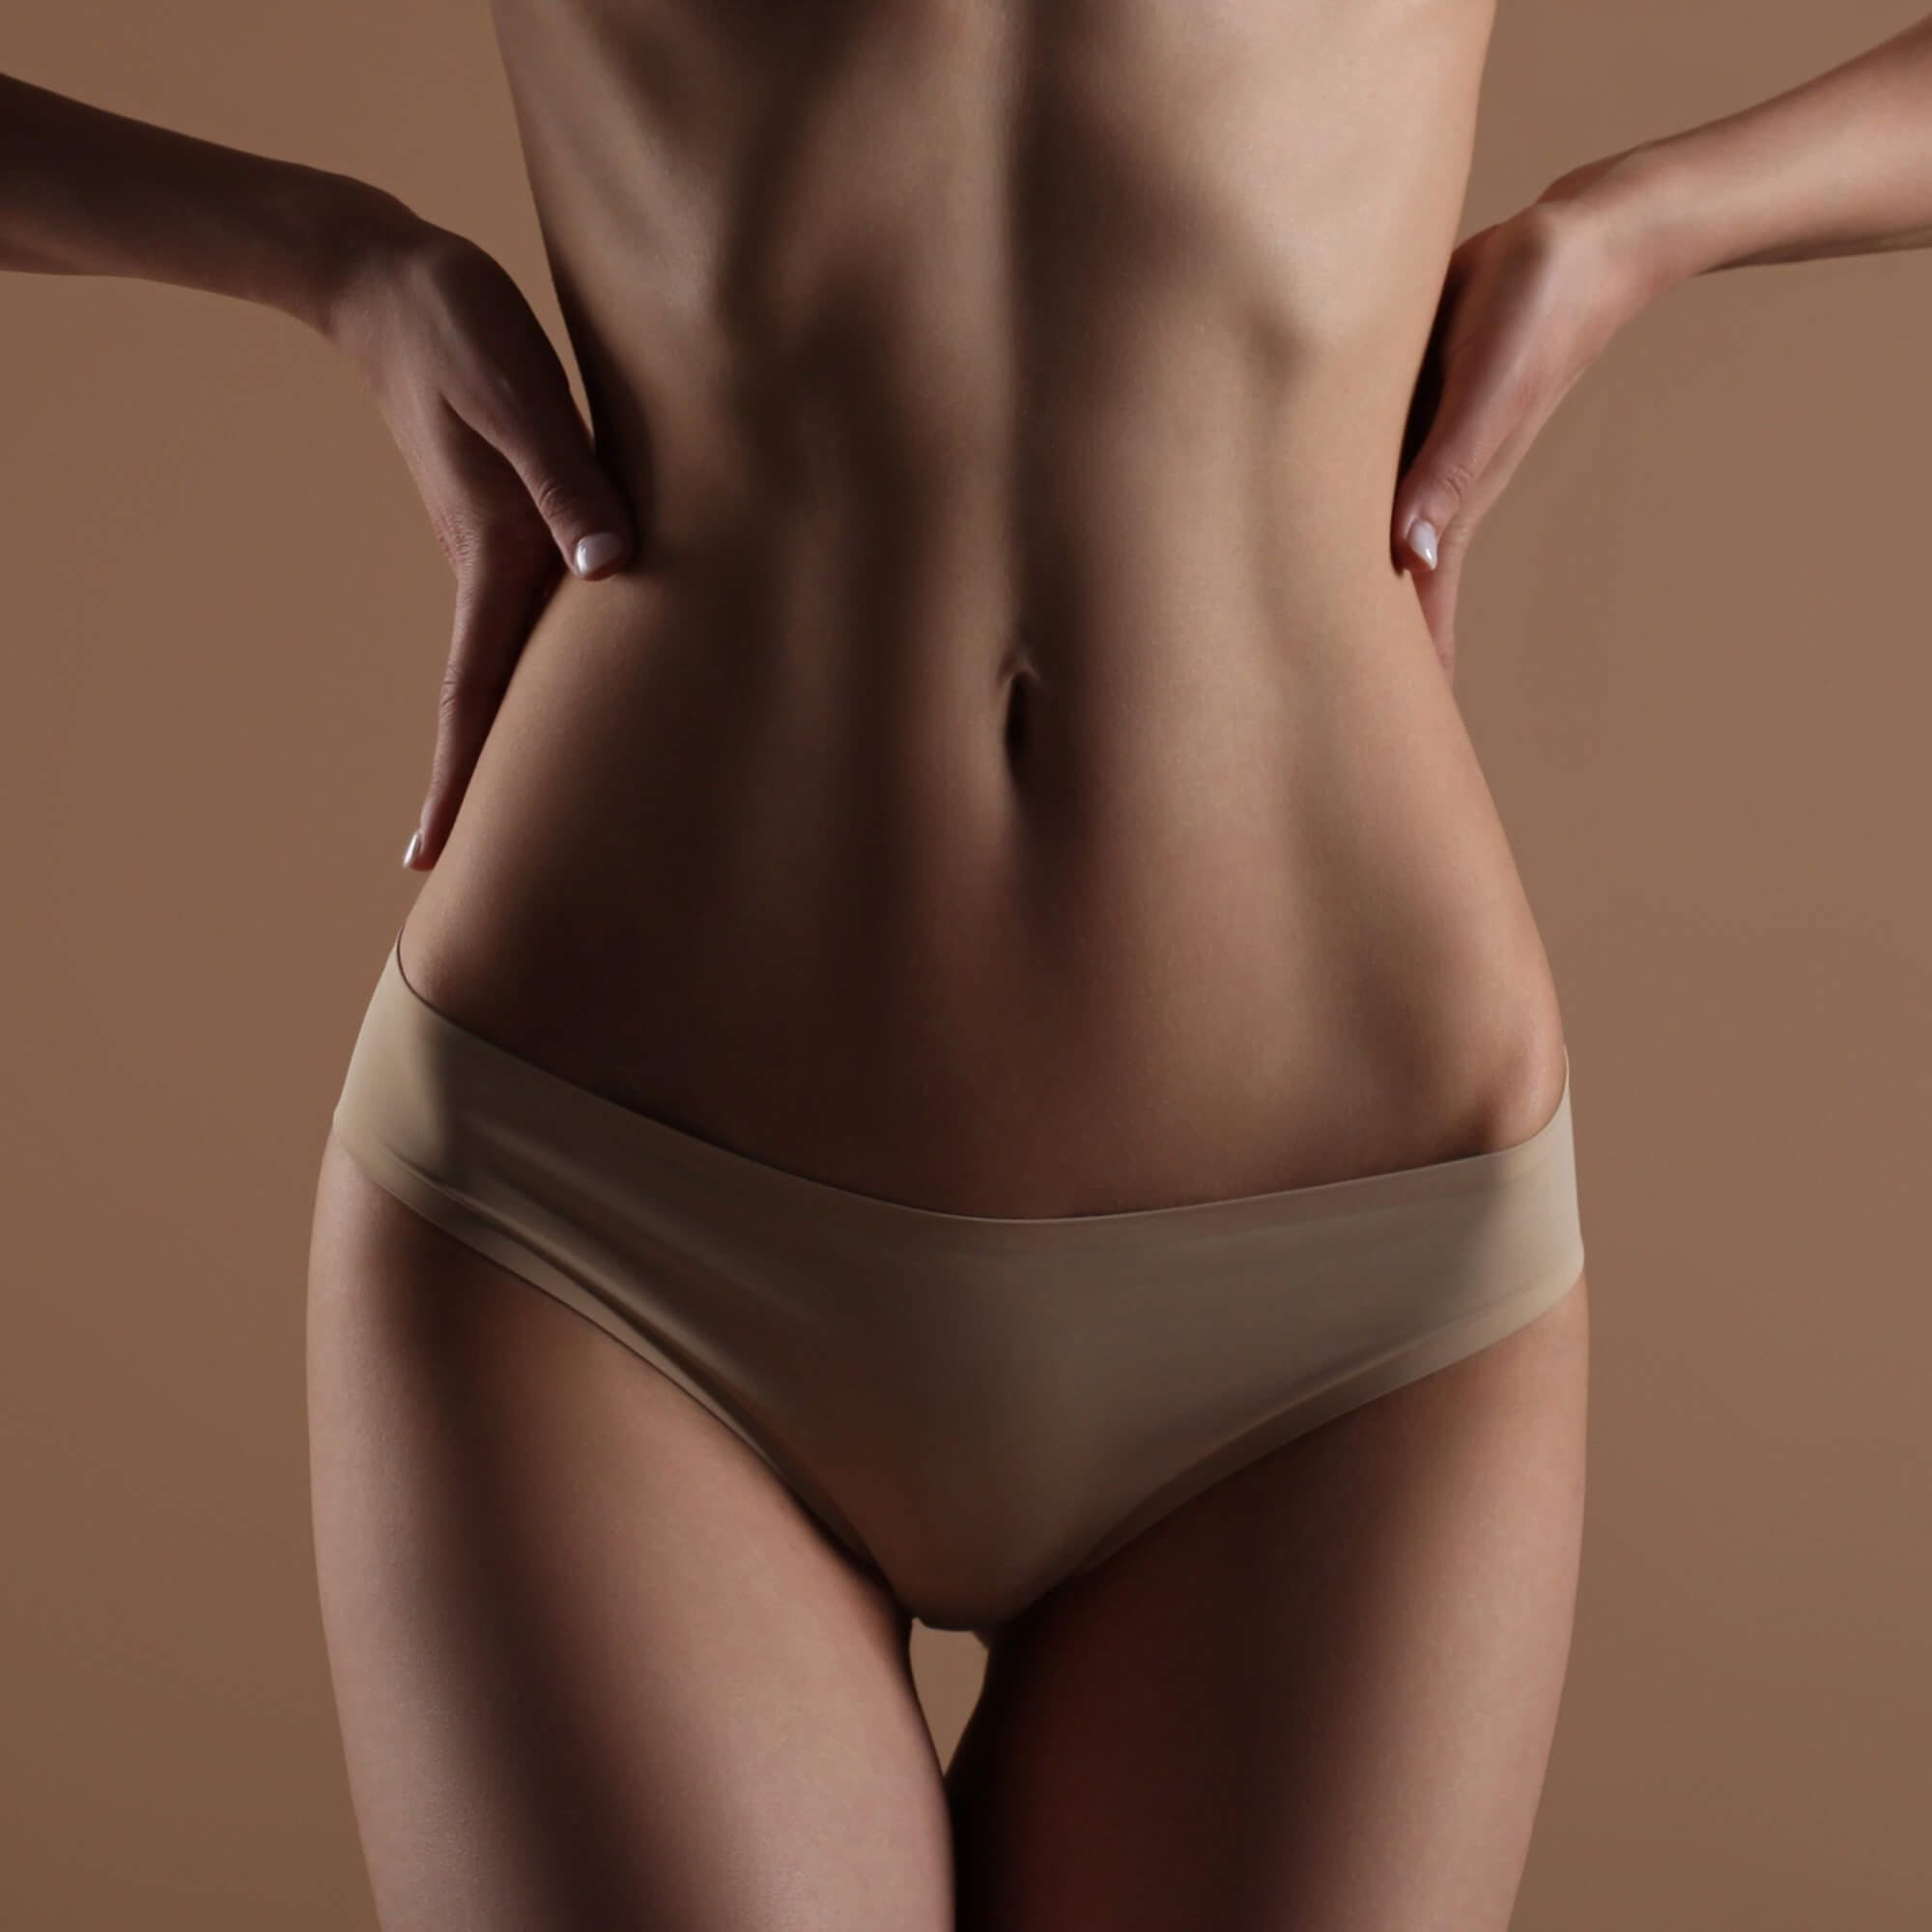 Waist Liposuction Recovery